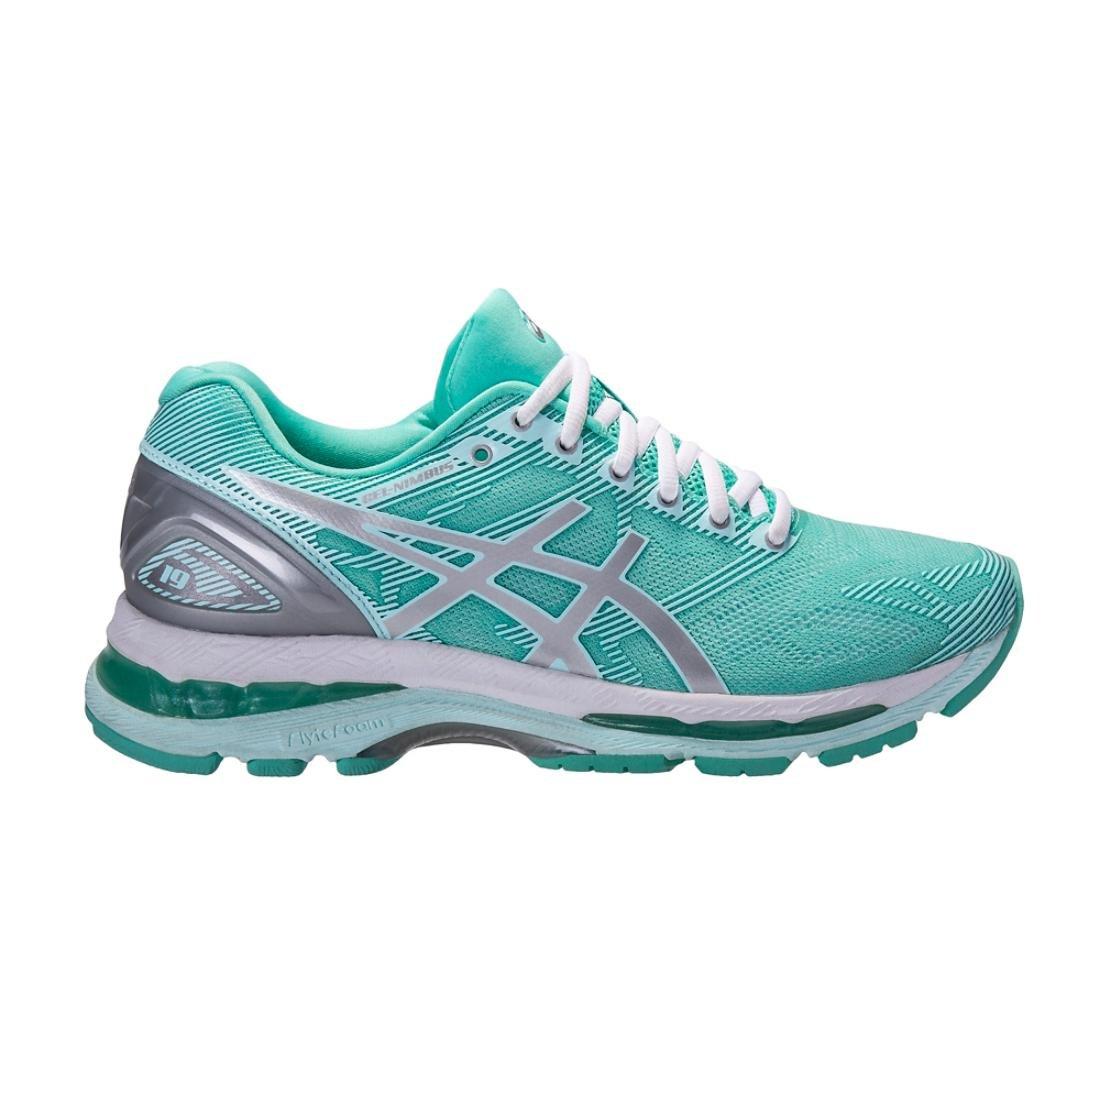 ASICS Women's Gel-Nimbus 19 Running Shoe B077F15K5S 6 B(M) US|Mint/Silver/Blue